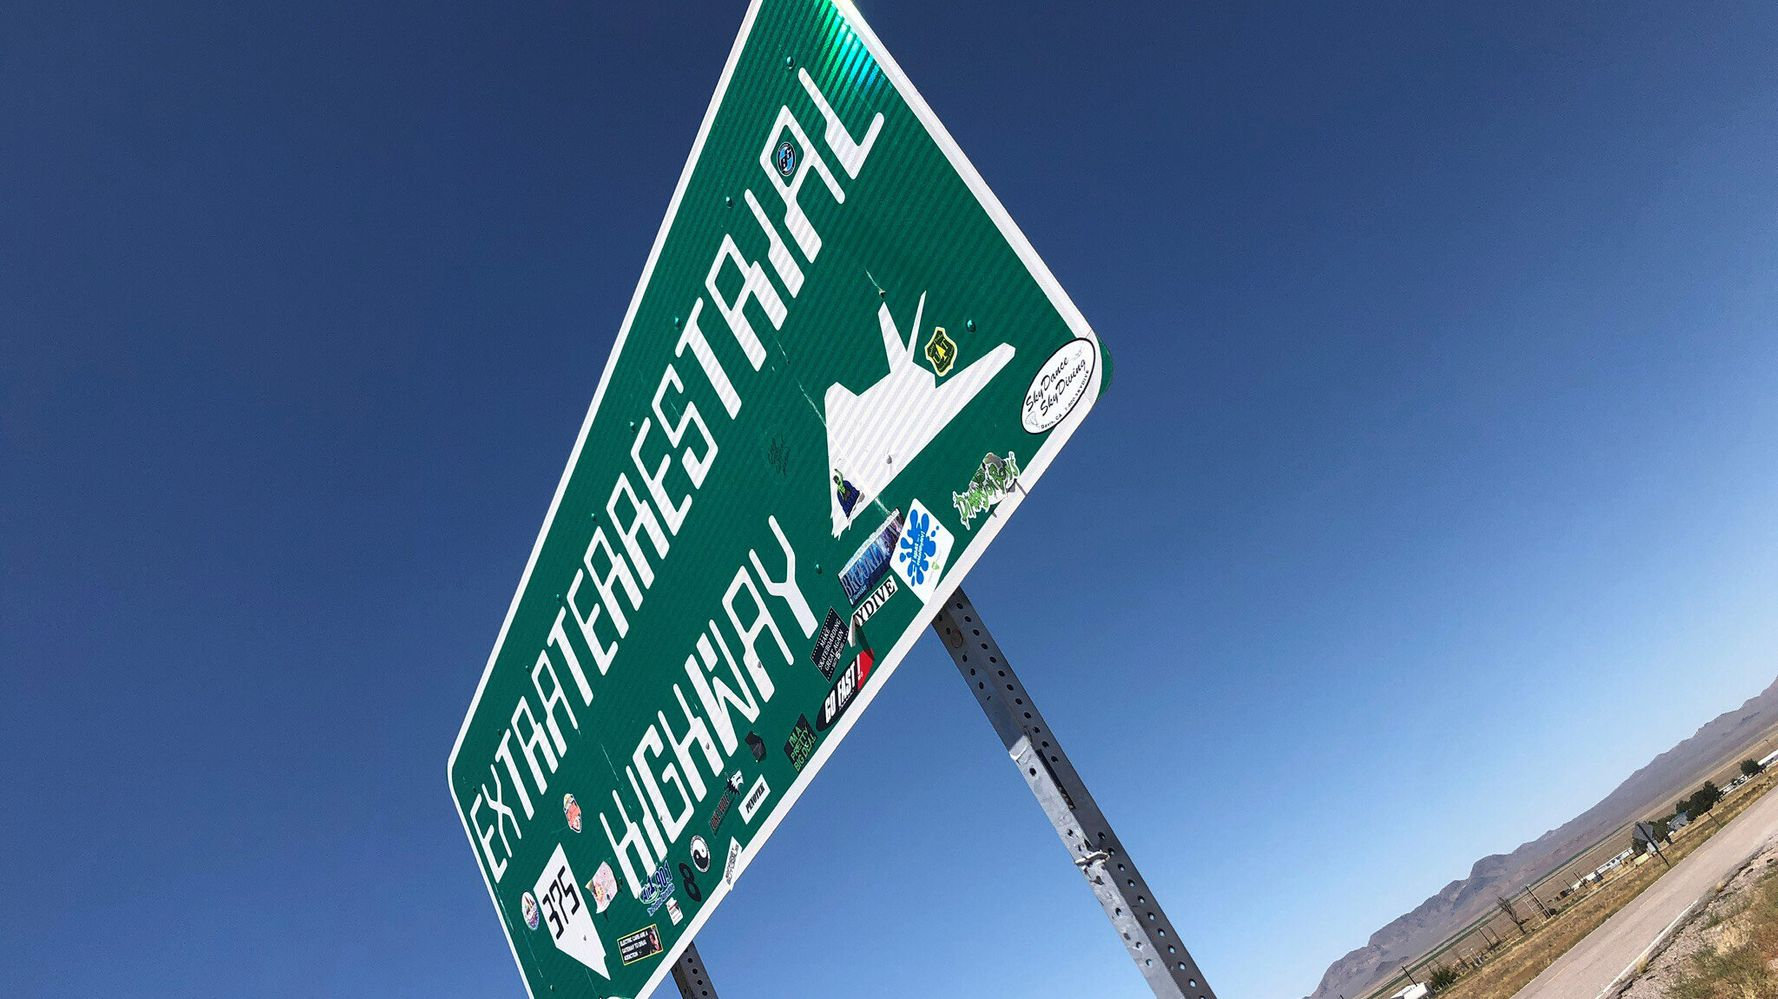 Nevada Town Near Area 51 Braces Itself For Hordes Of Alien Hunters